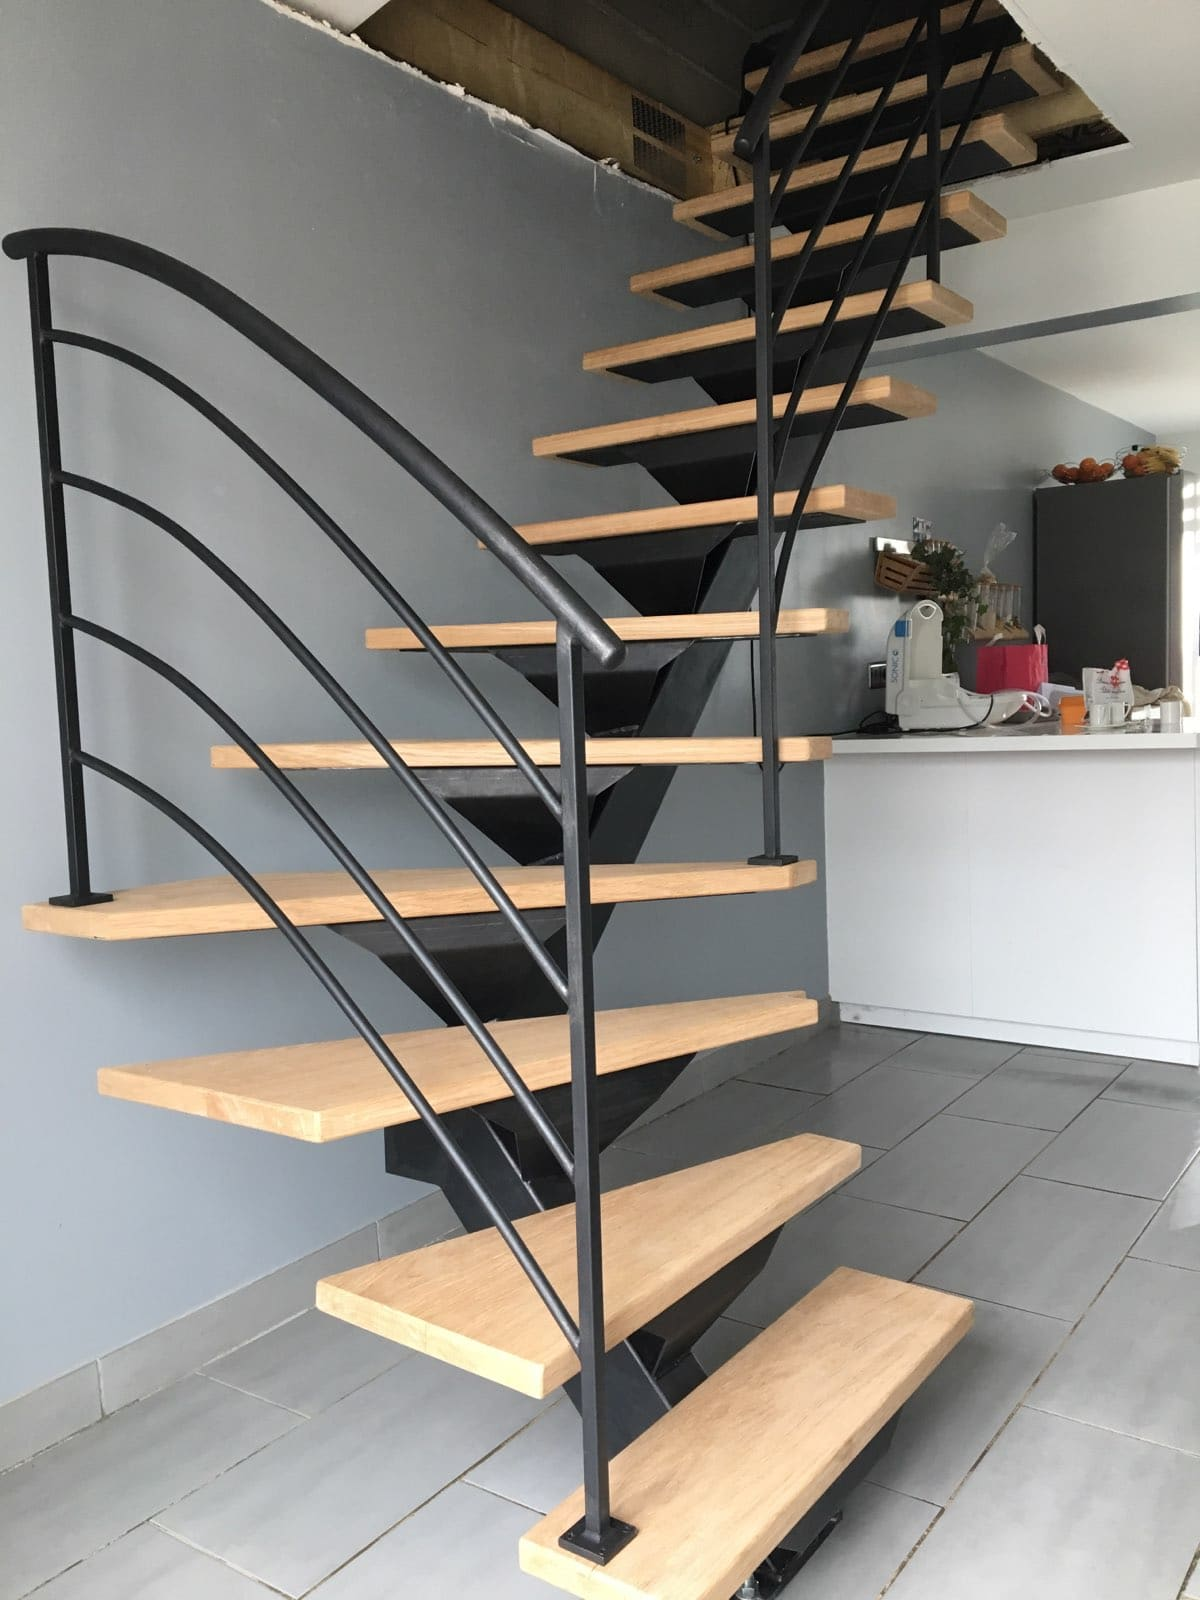 maison bourrellier escalier IMG_30491